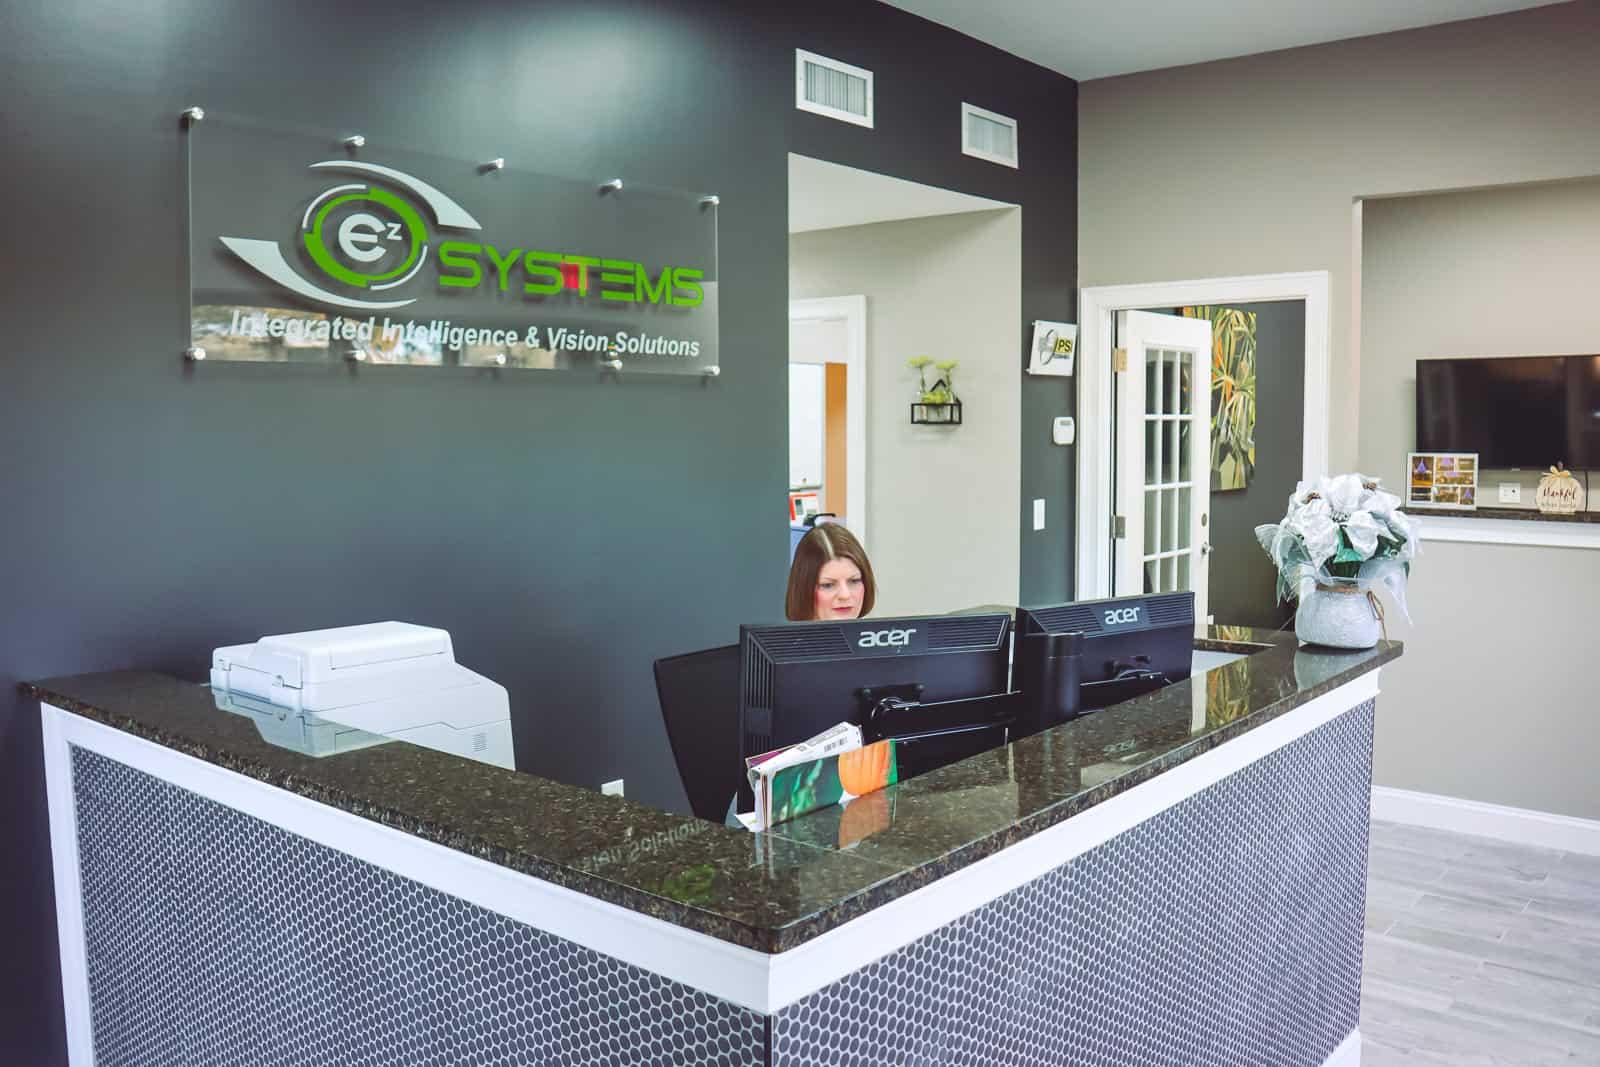 https://www.ezsystemsllc.com/wp-content/uploads/2020/12/EZ-Systems-Jacksonville-Florida-10-1.jpg